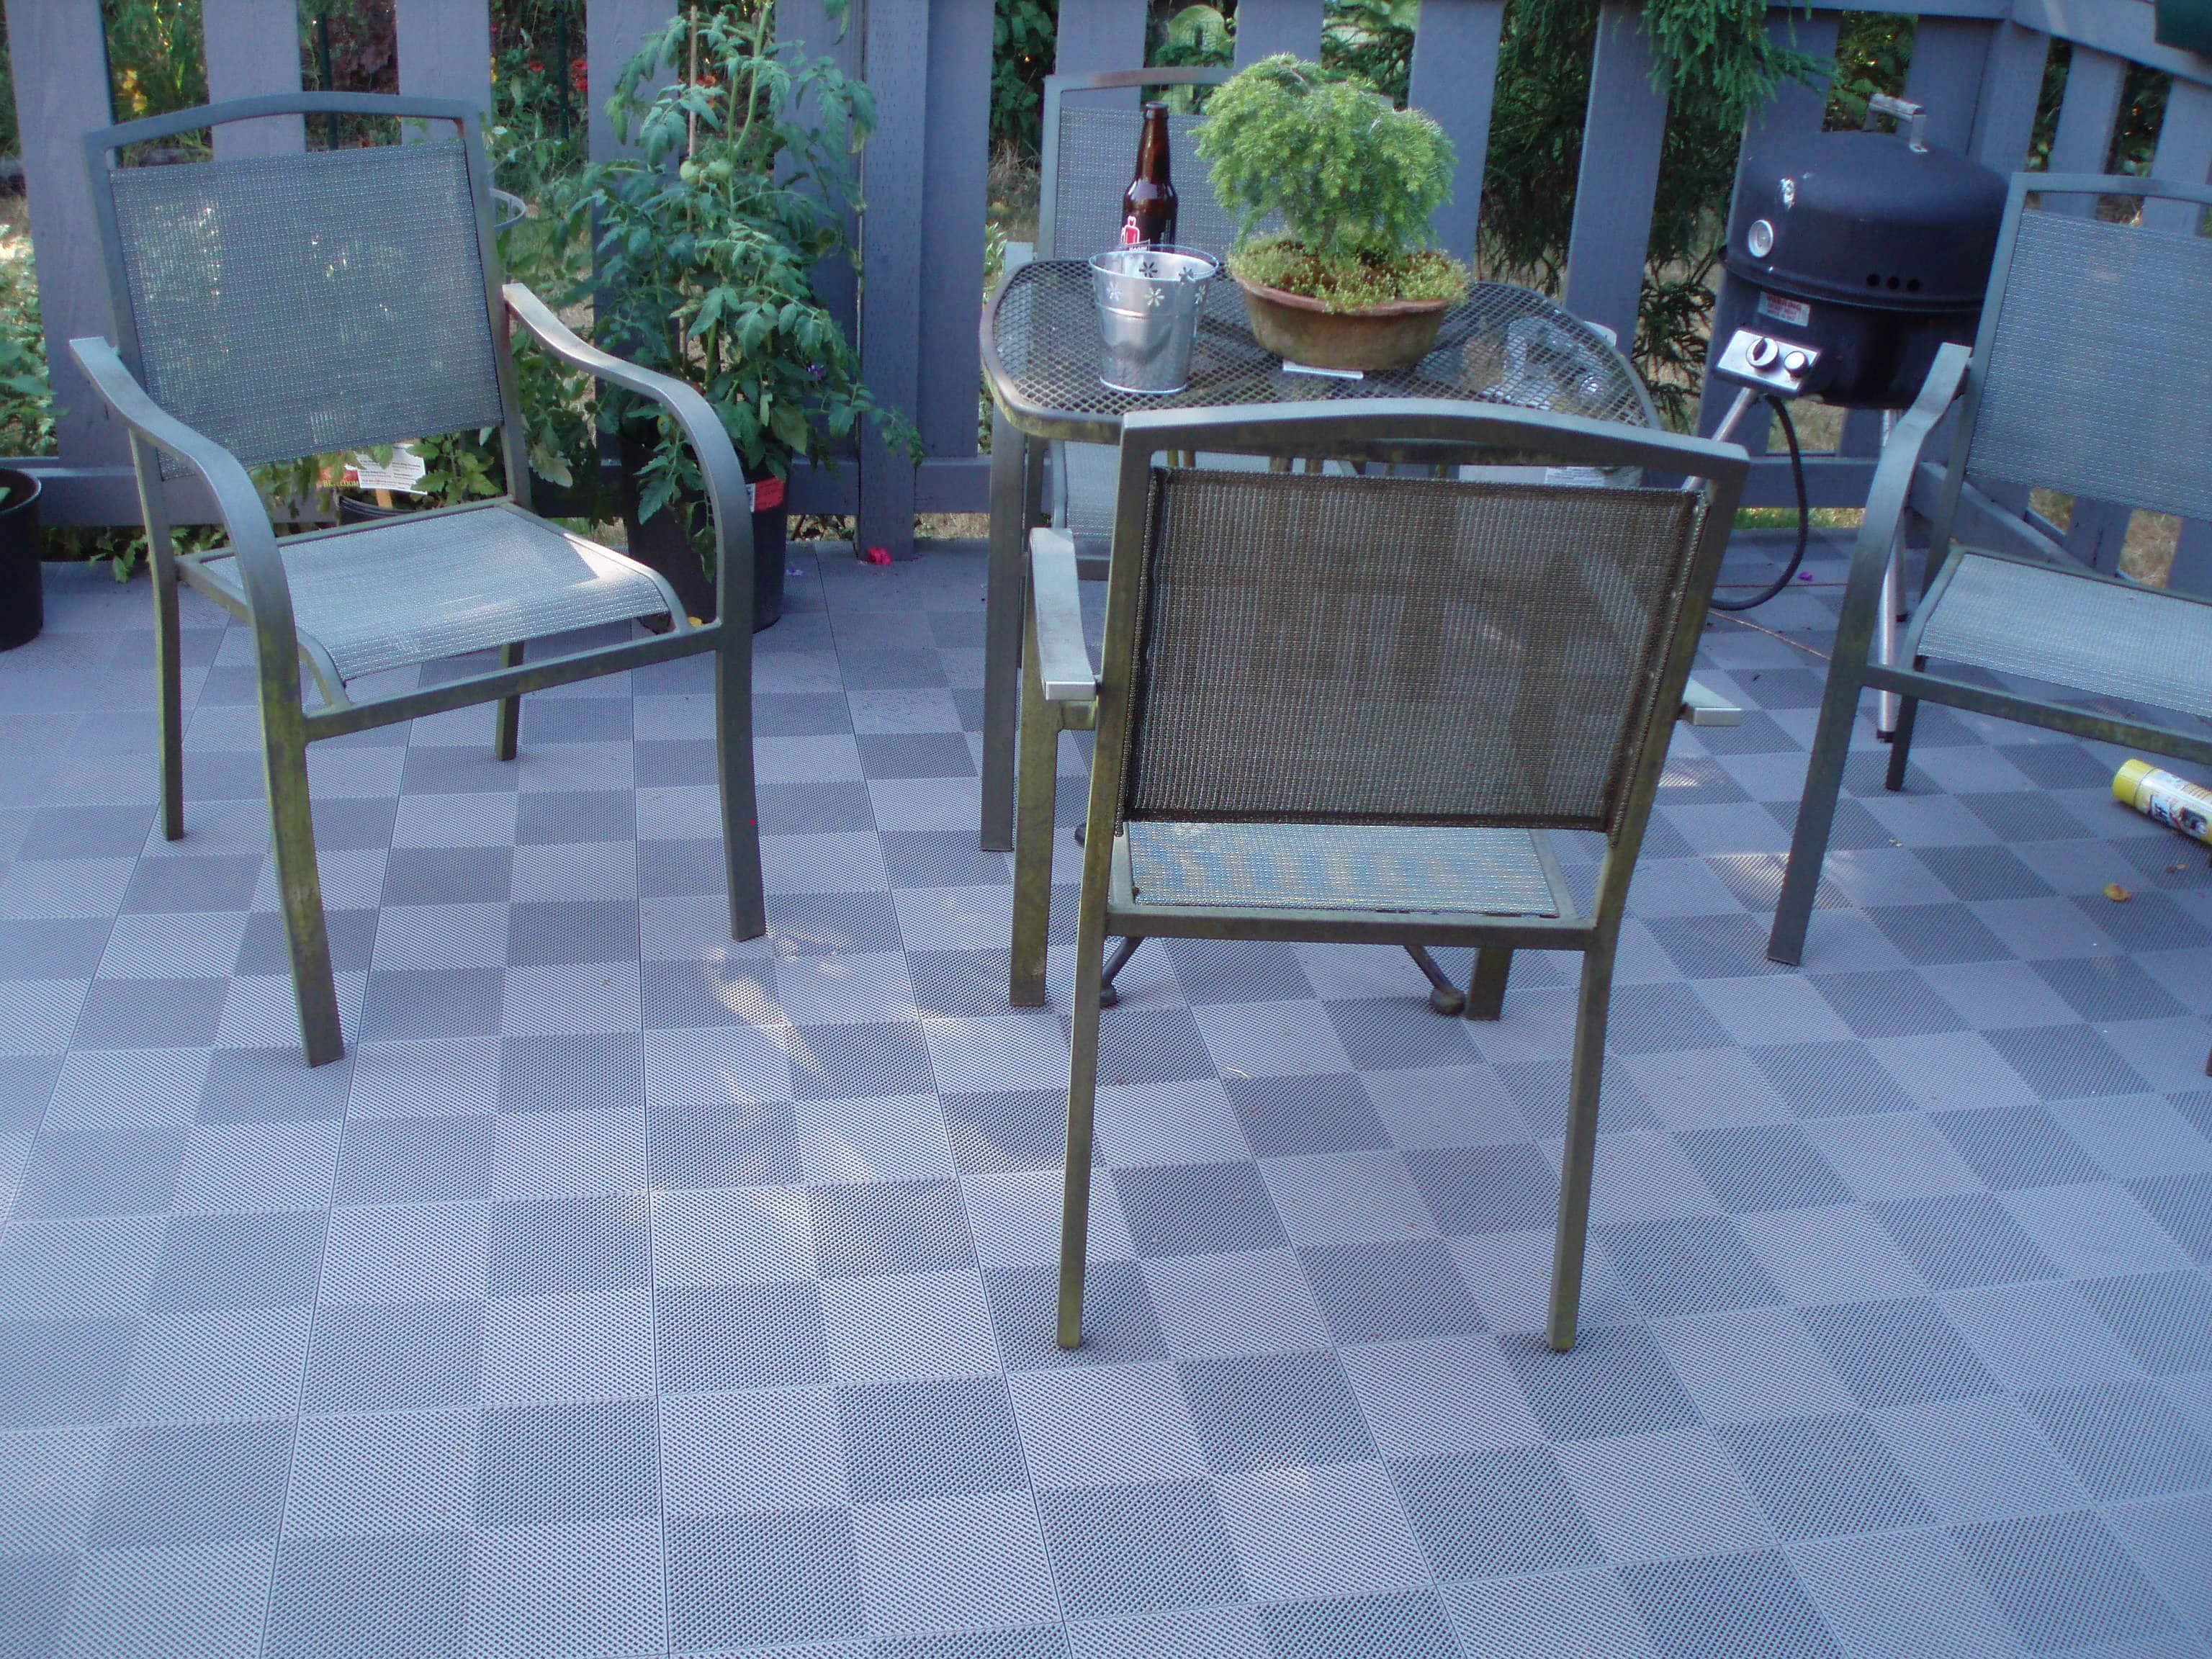 BlockTile Interlocking Deck Tiles Multi Purpose Perforated Gray